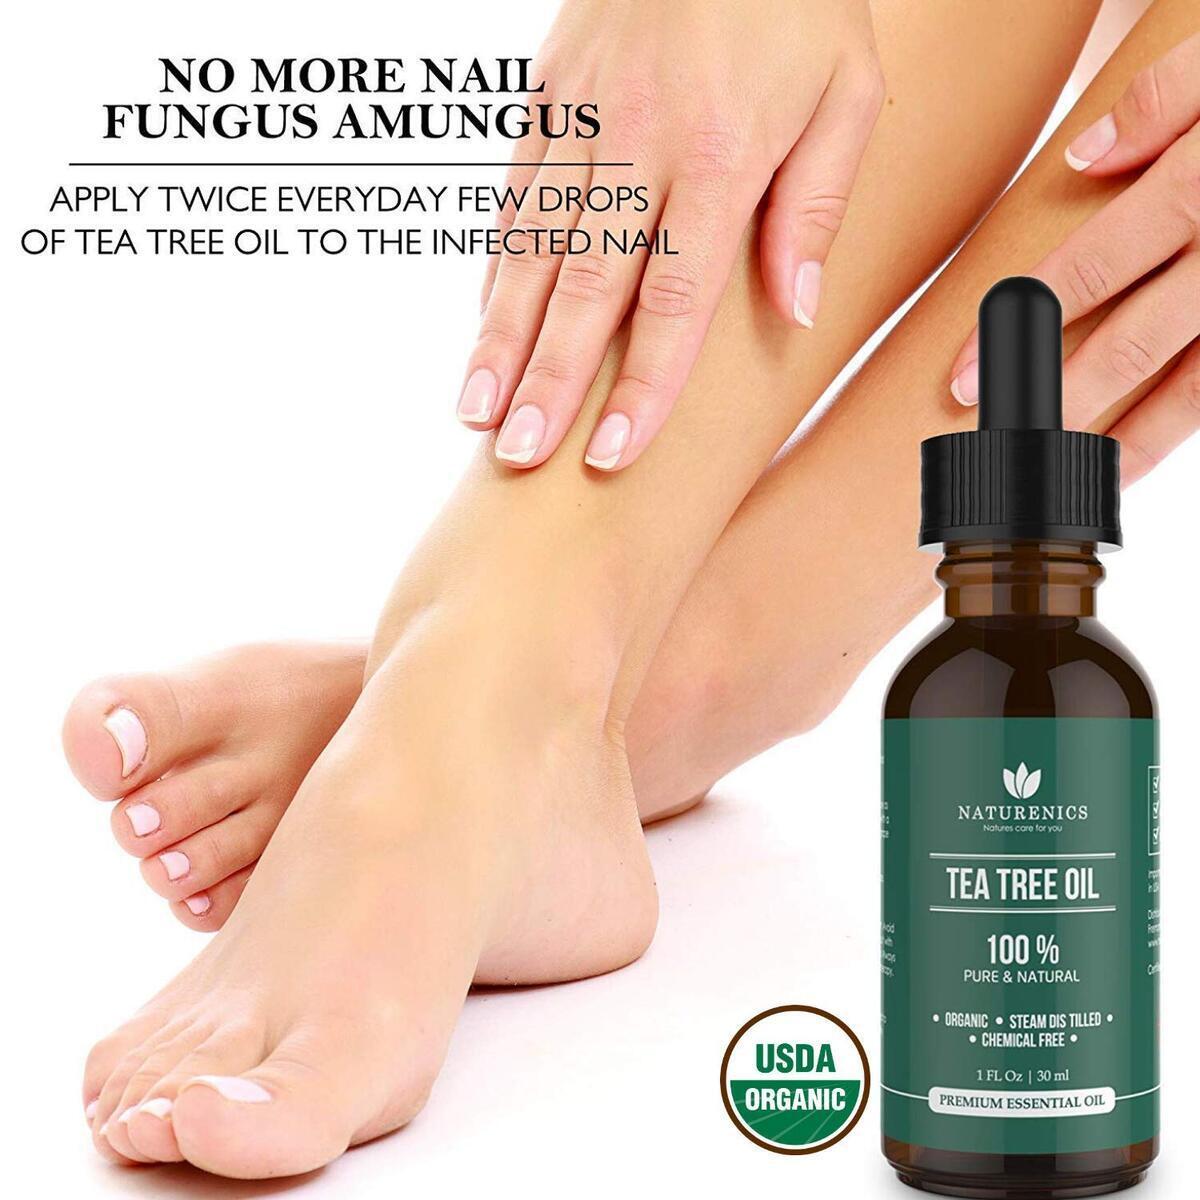 Naturenics Premium 100% Organic Tea Tree Essential Oil -Undiluted Pure USDA Certified Melaleuca Alternifolia Therapeutic Grade - For Toenail Fungus & Acne Treatment - Roll On & eBook